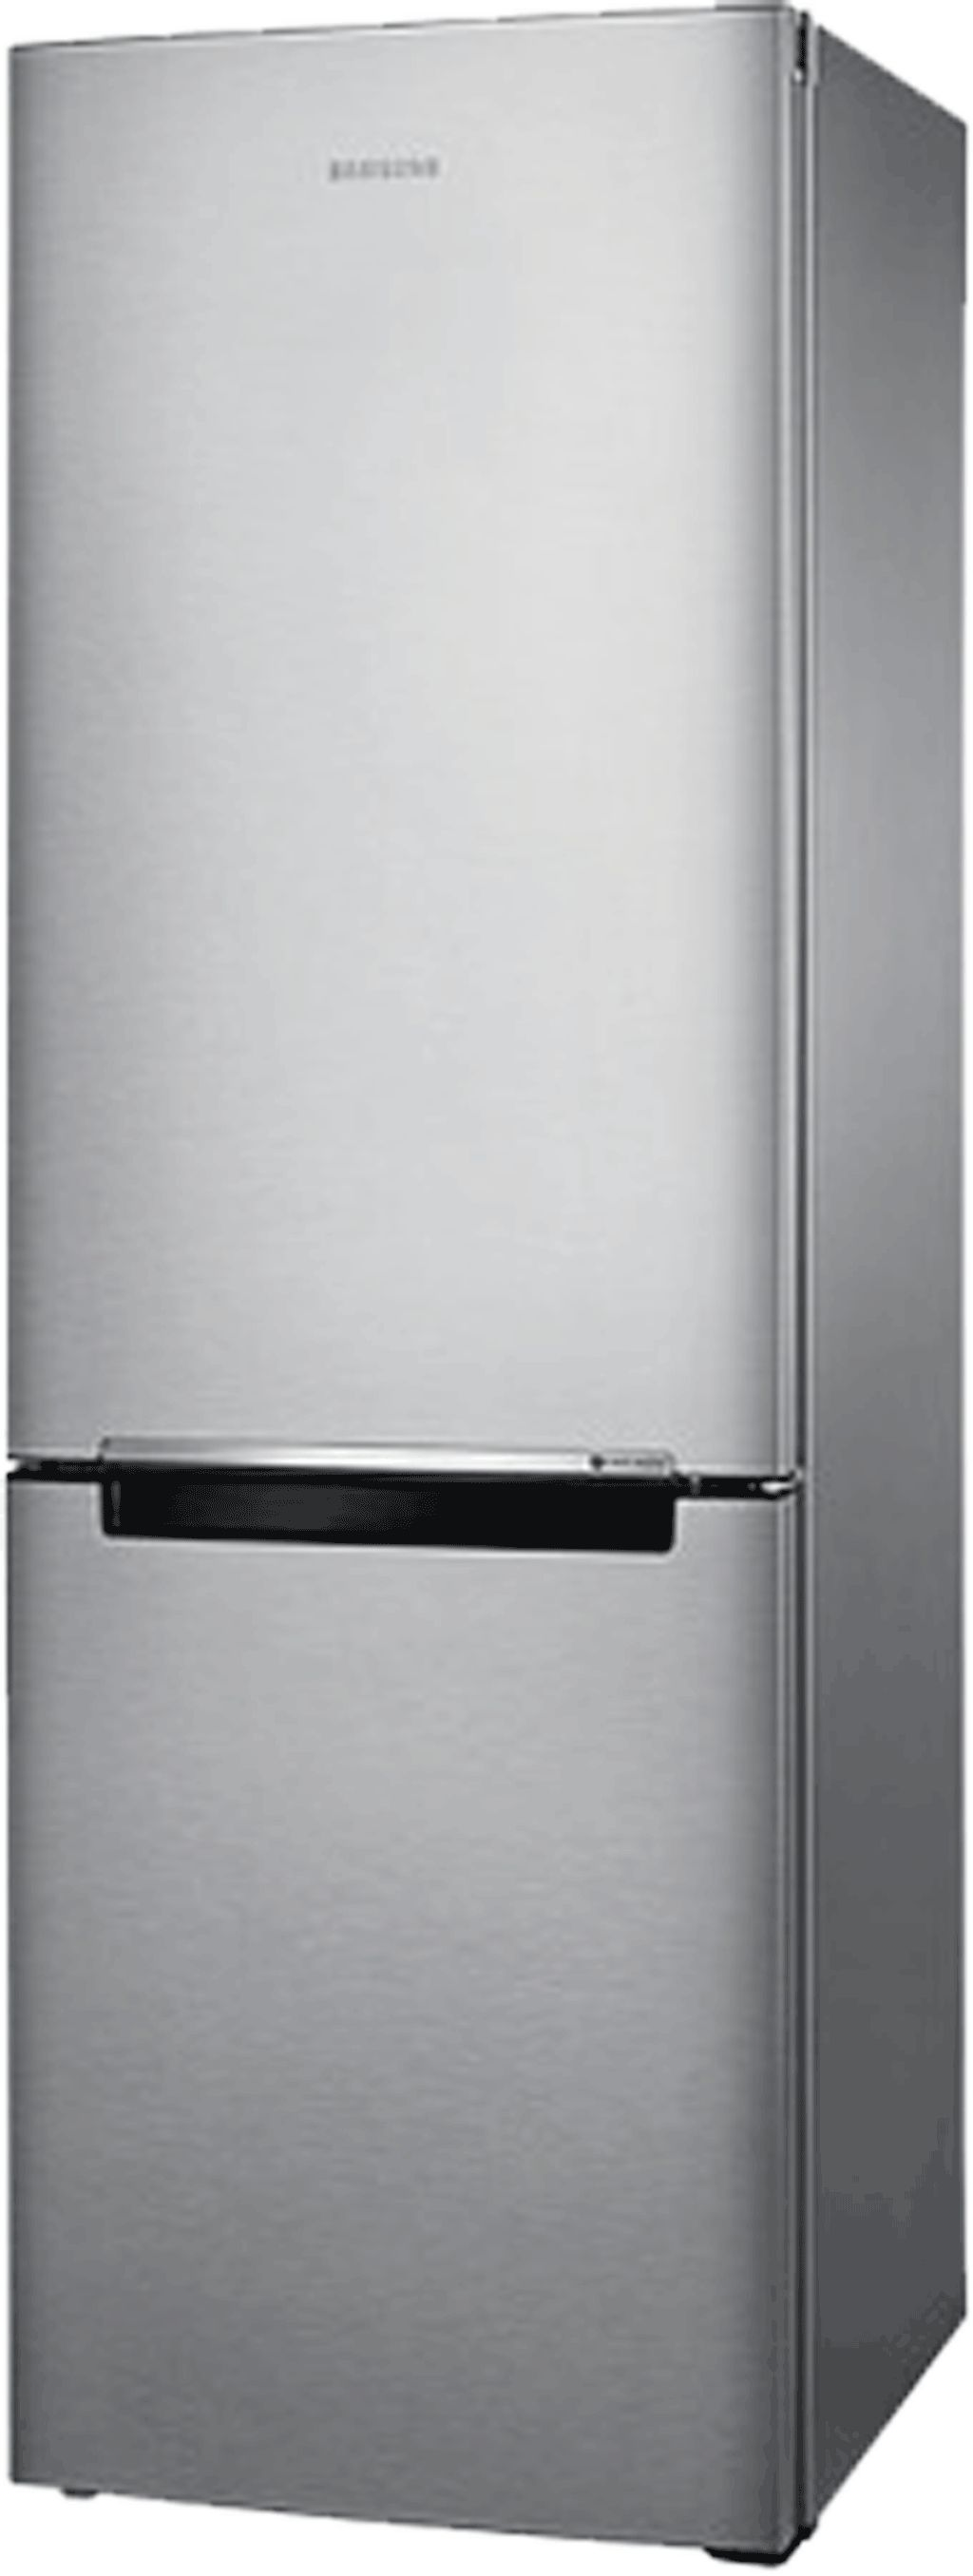 b12ec9e4ec93 Холодильник Samsung RB-30 J3000SA